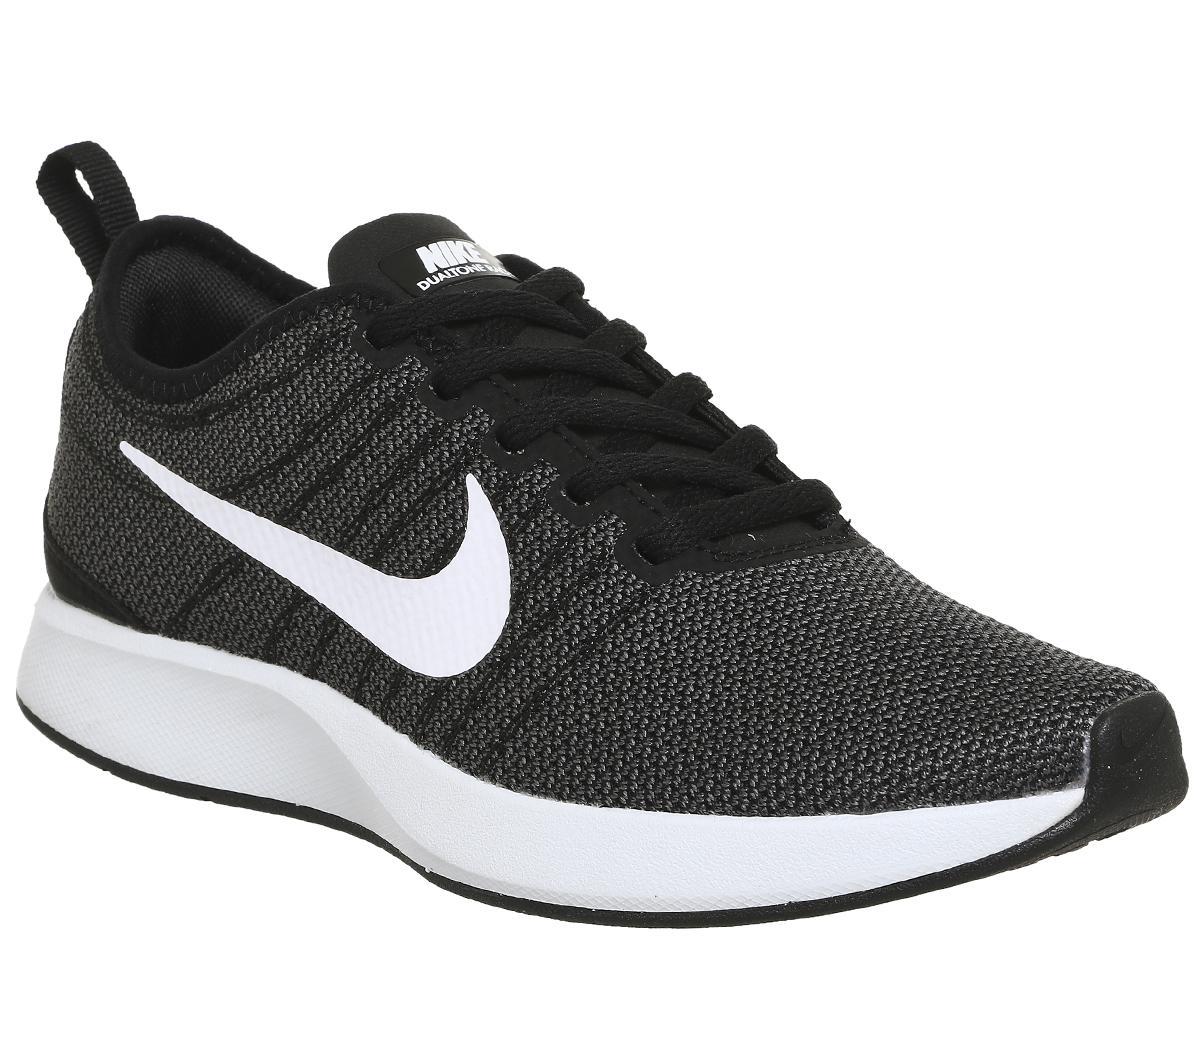 Nike Dualtone Racer Black White - Hers